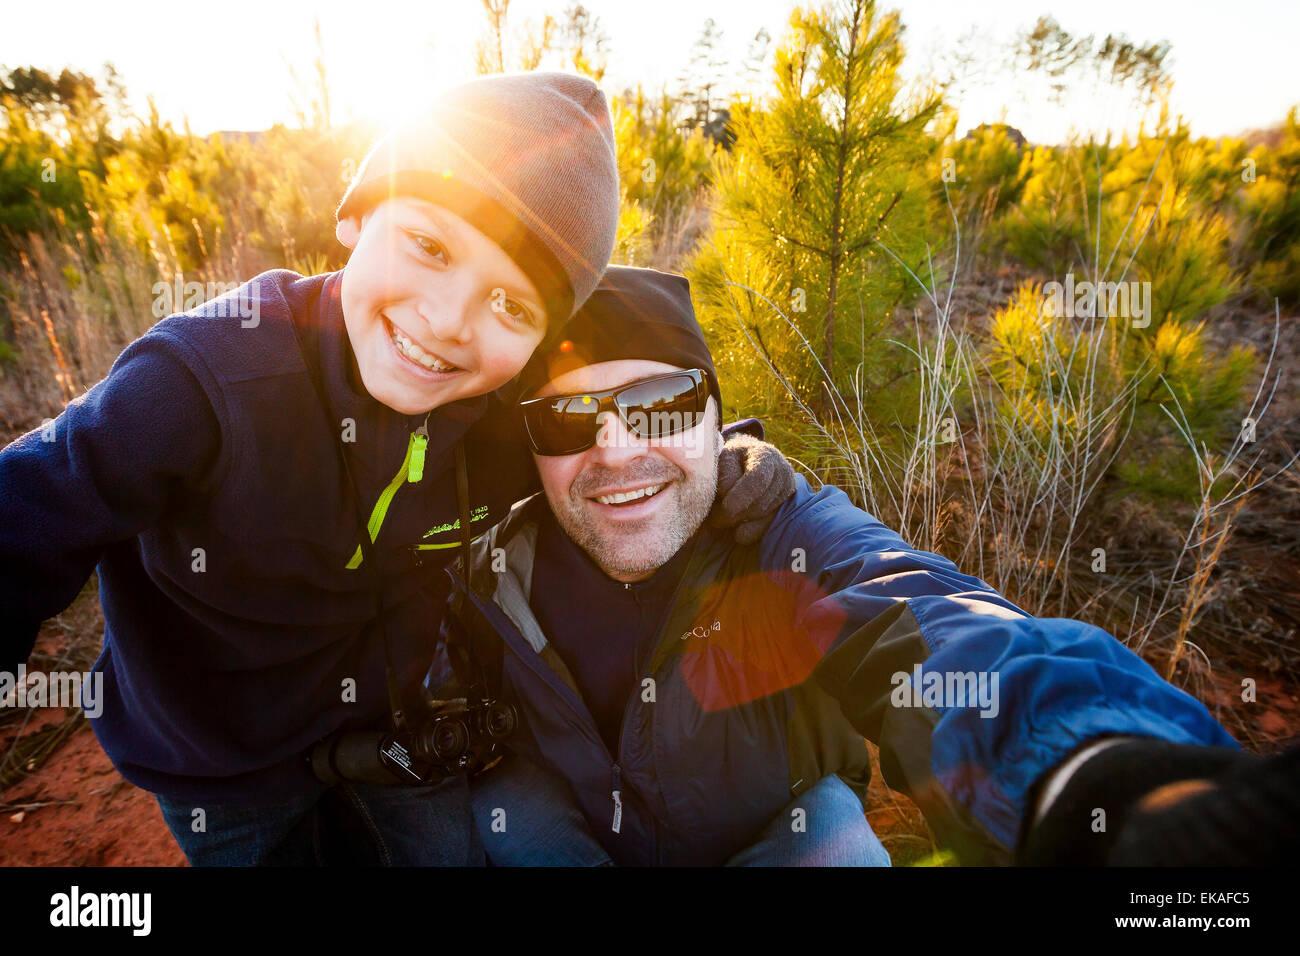 Padre e hijo teniendo un selfie Imagen De Stock